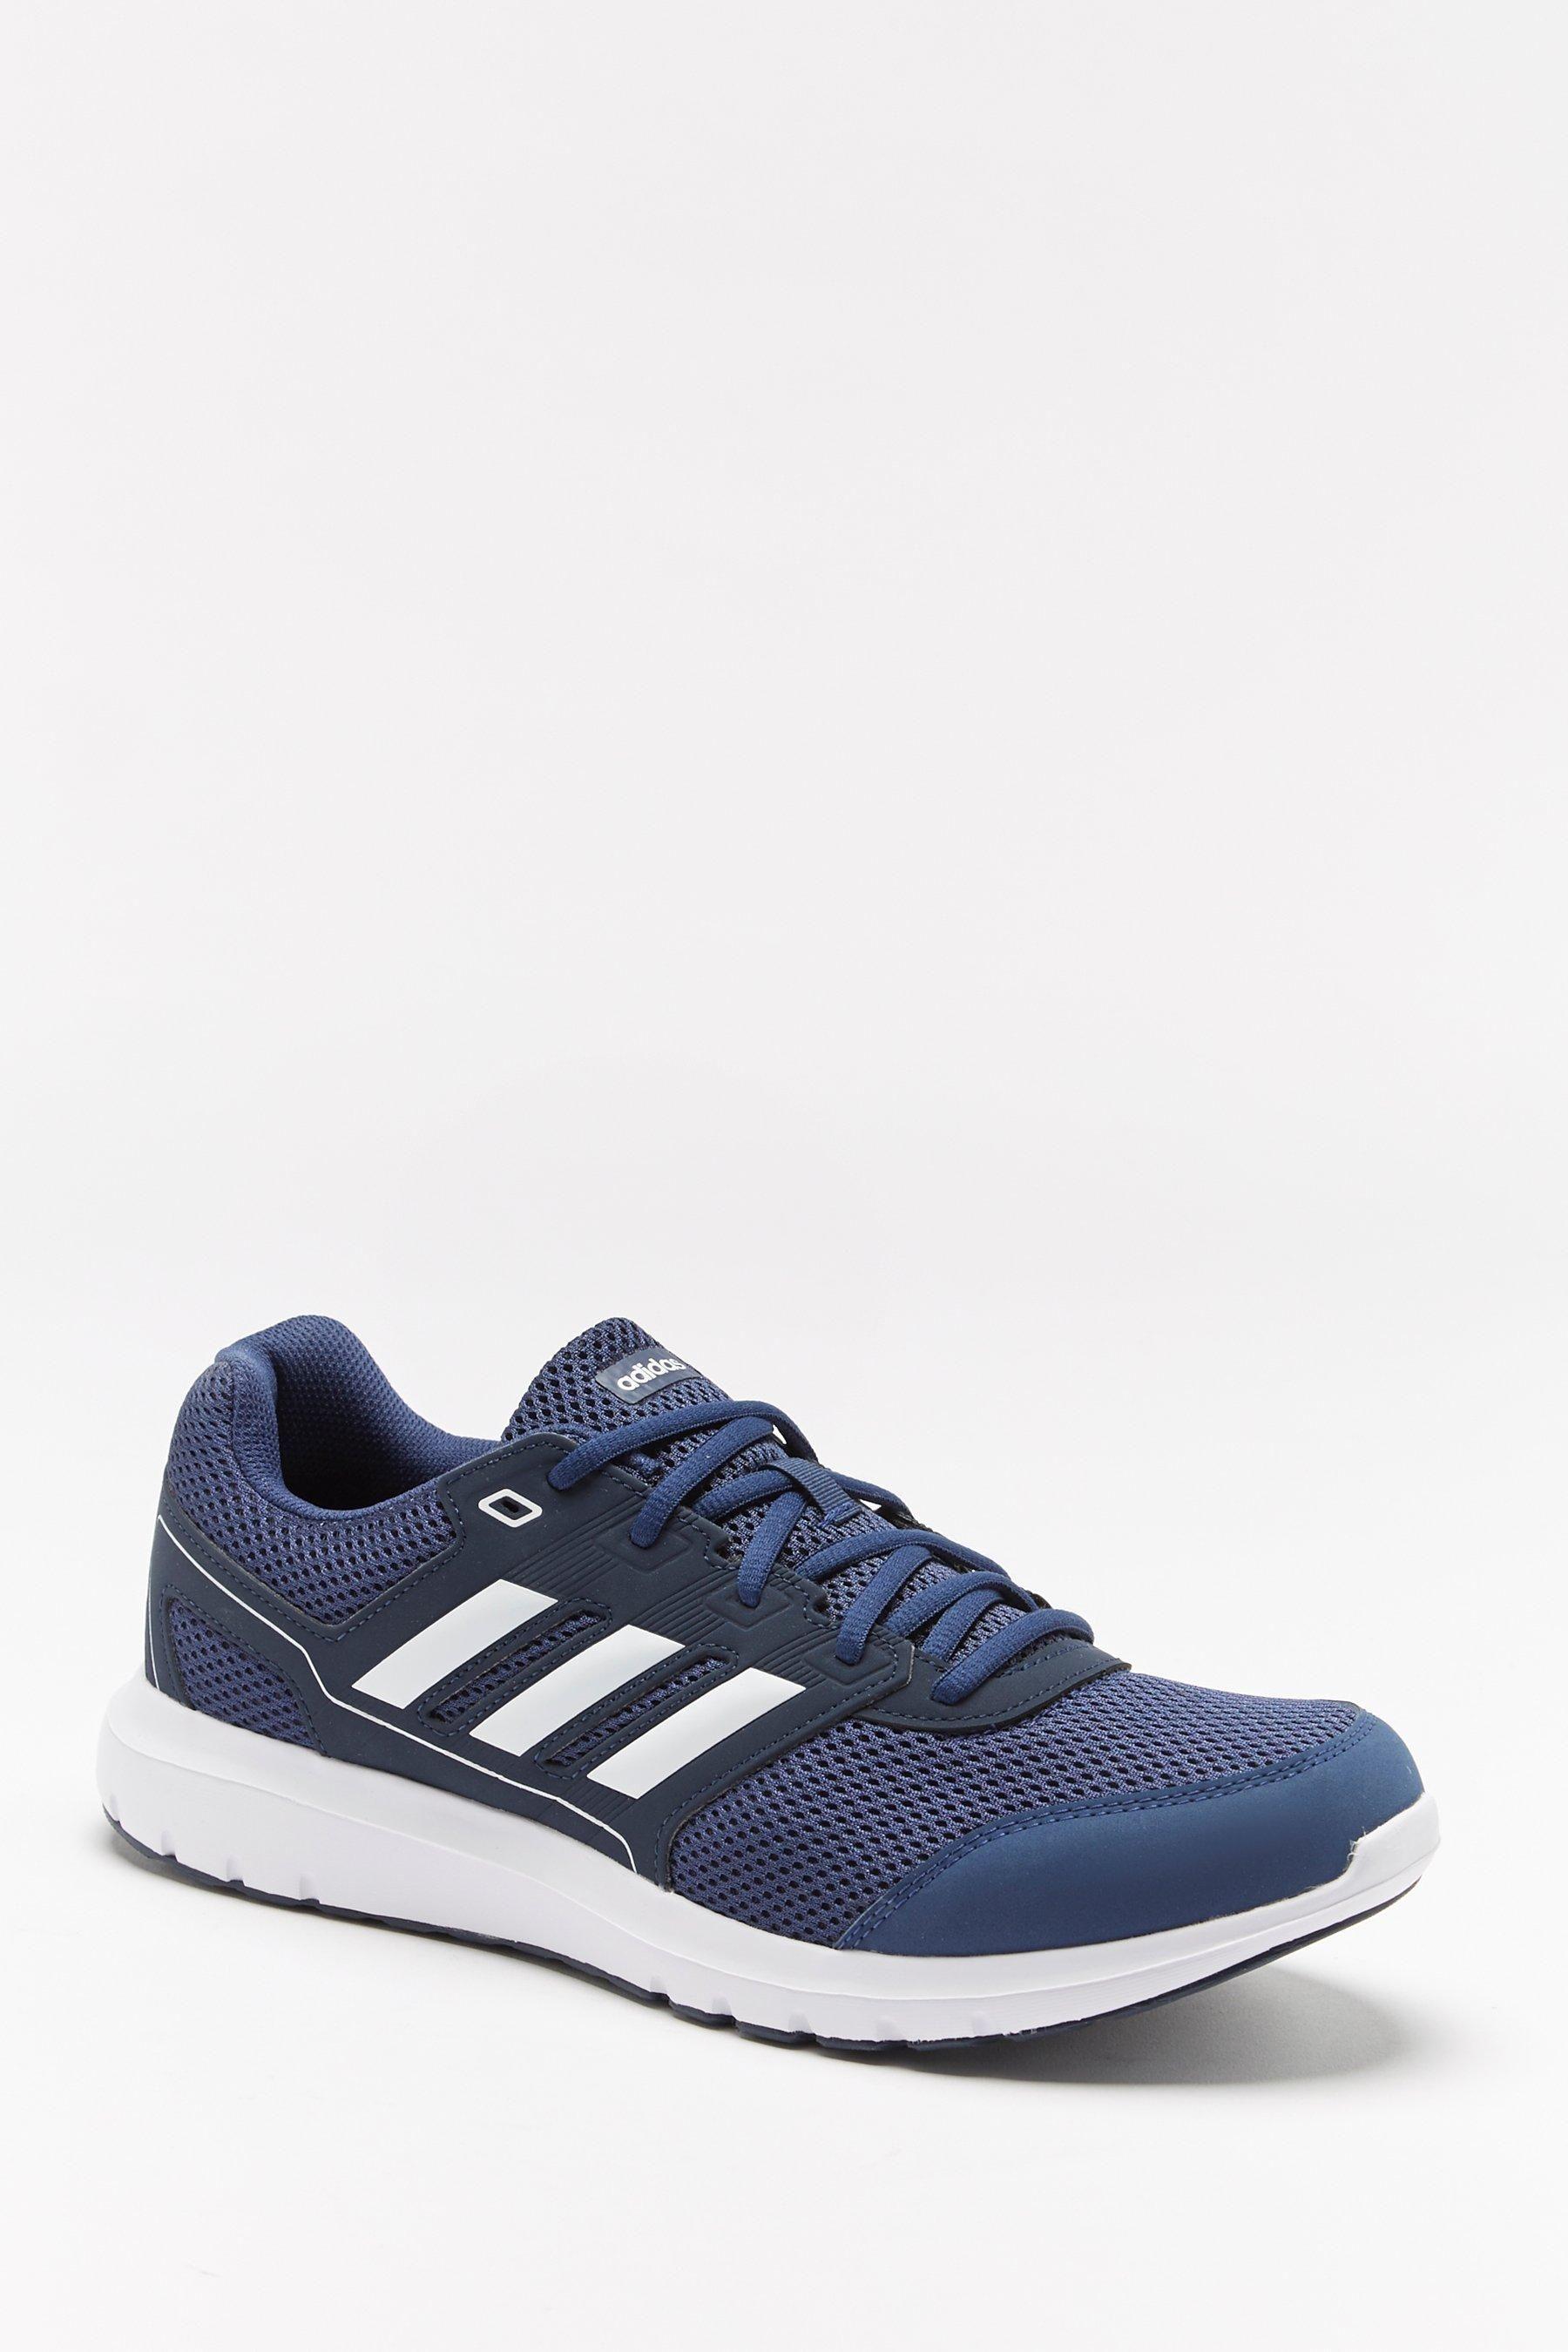 Adidas To £39 Adidas Buy 99Stuff 2IWE9YDH